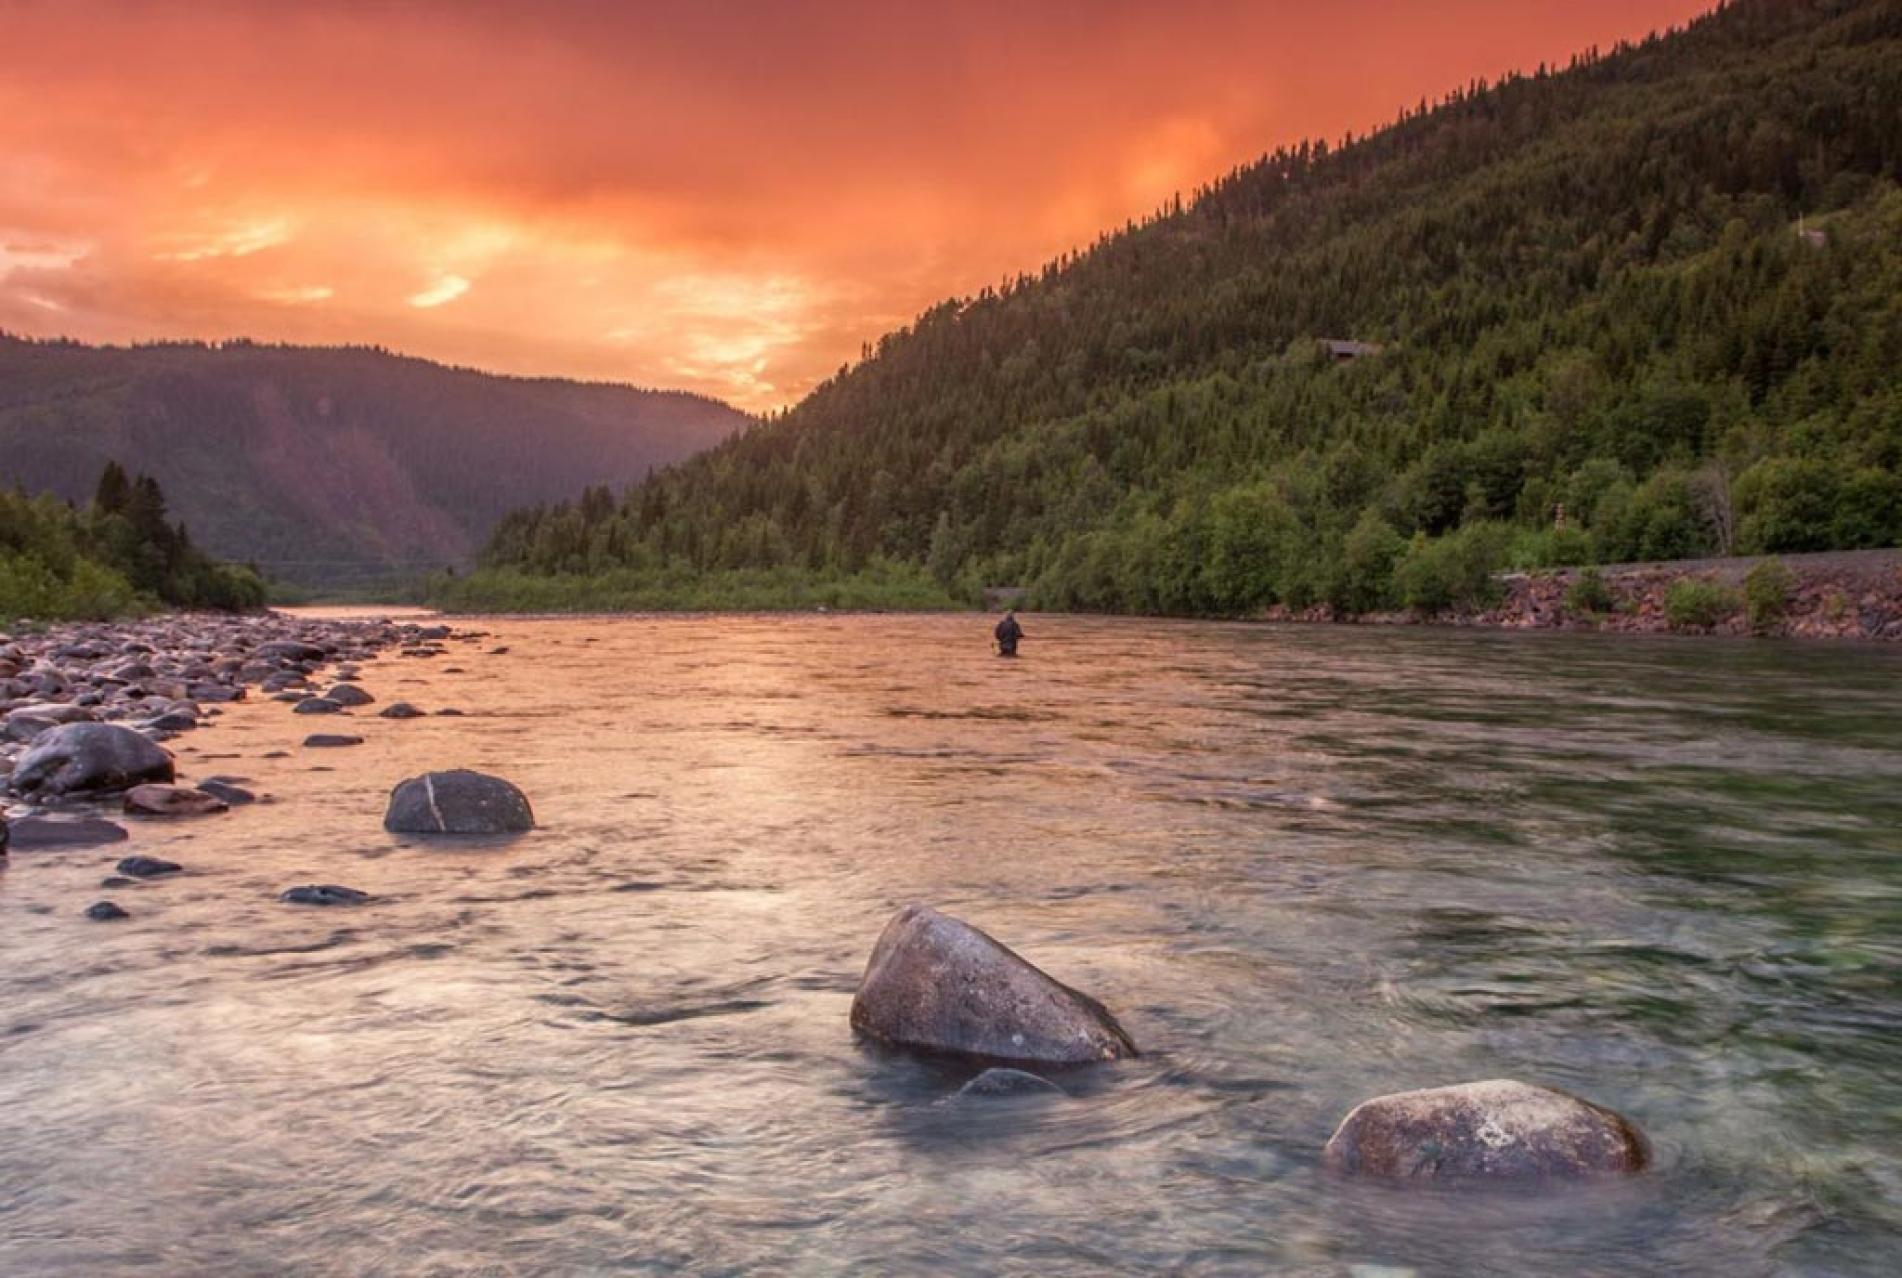 sunset salmon fishing in norway